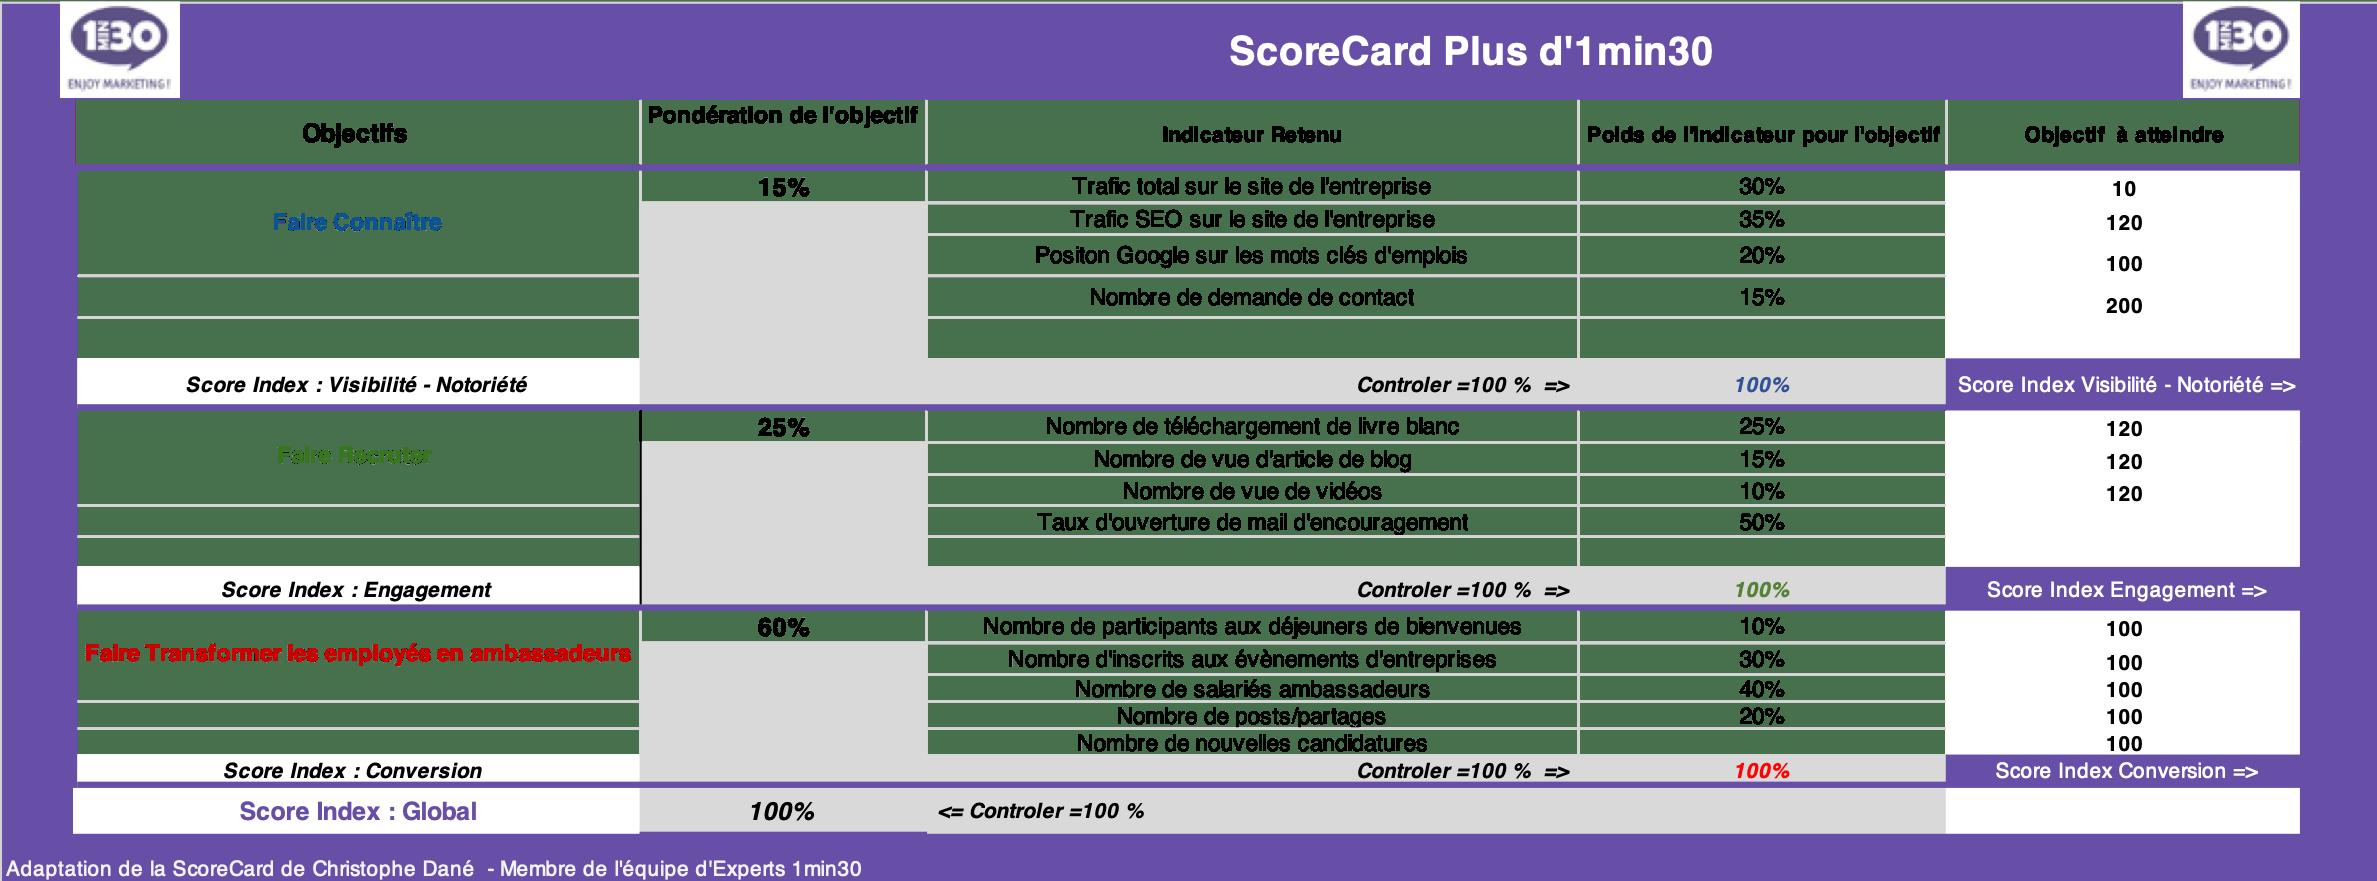 scorecard-marque-employeur